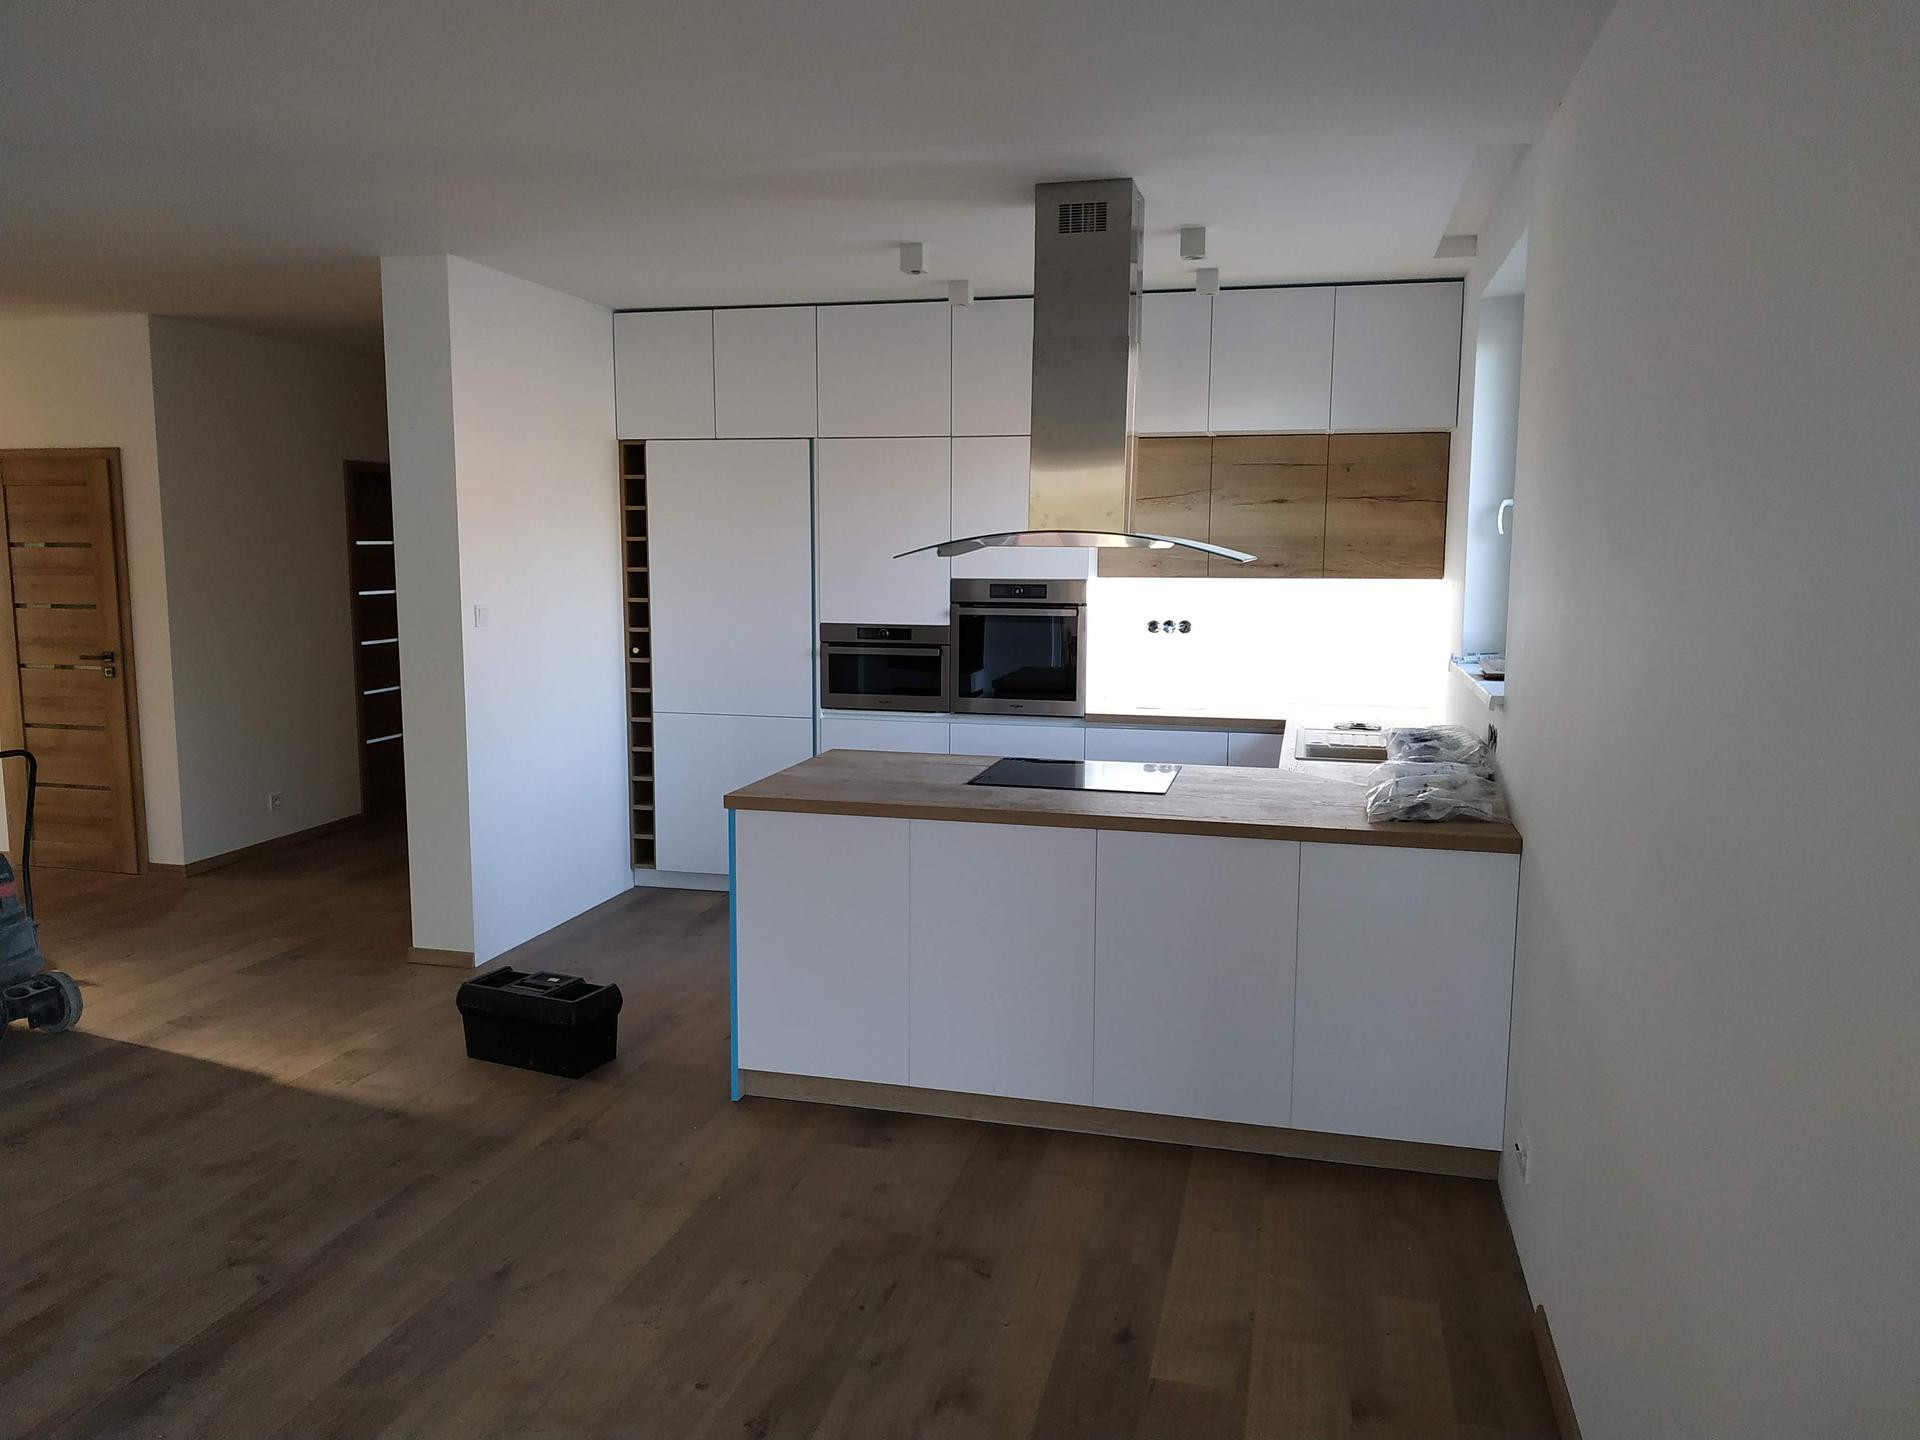 Kuchyna - Obrázok č. 1